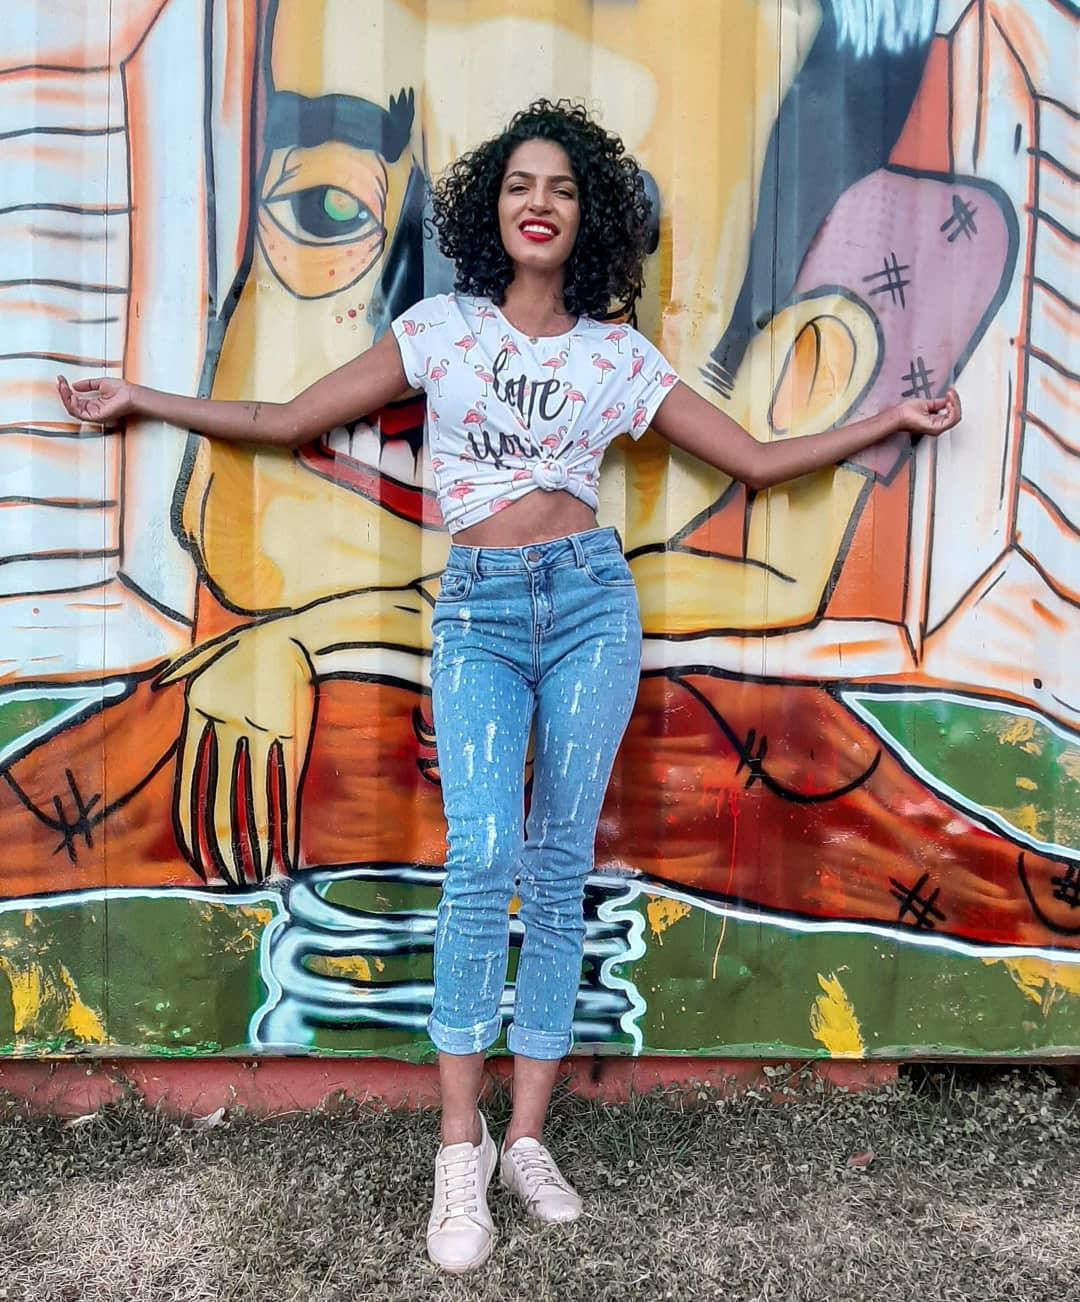 geicyelly mendes, top 20 de miss brasil mundo 2019. - Página 4 Fy0yar10